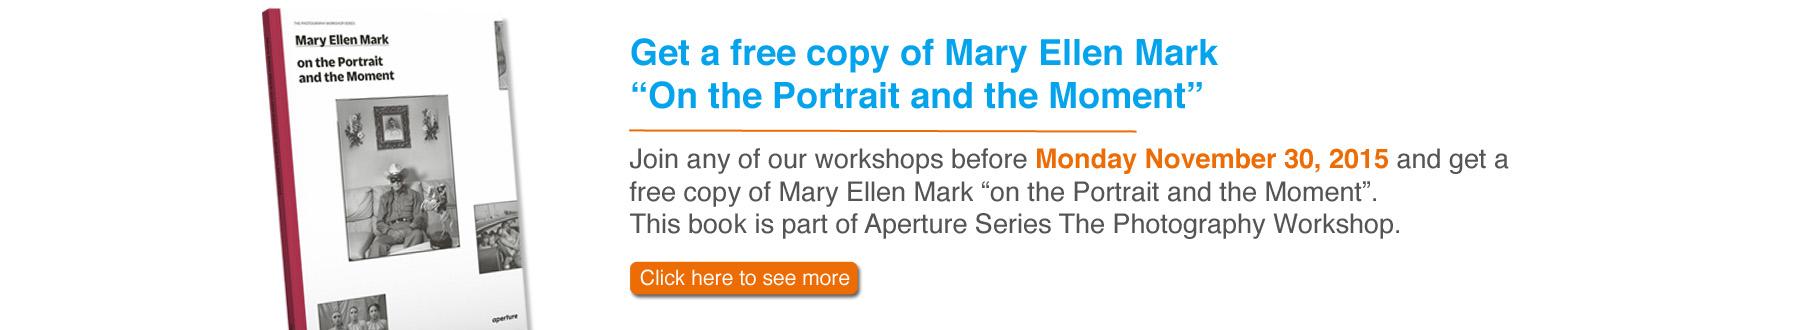 Mary Ellen Mark Aperture Book Promotion